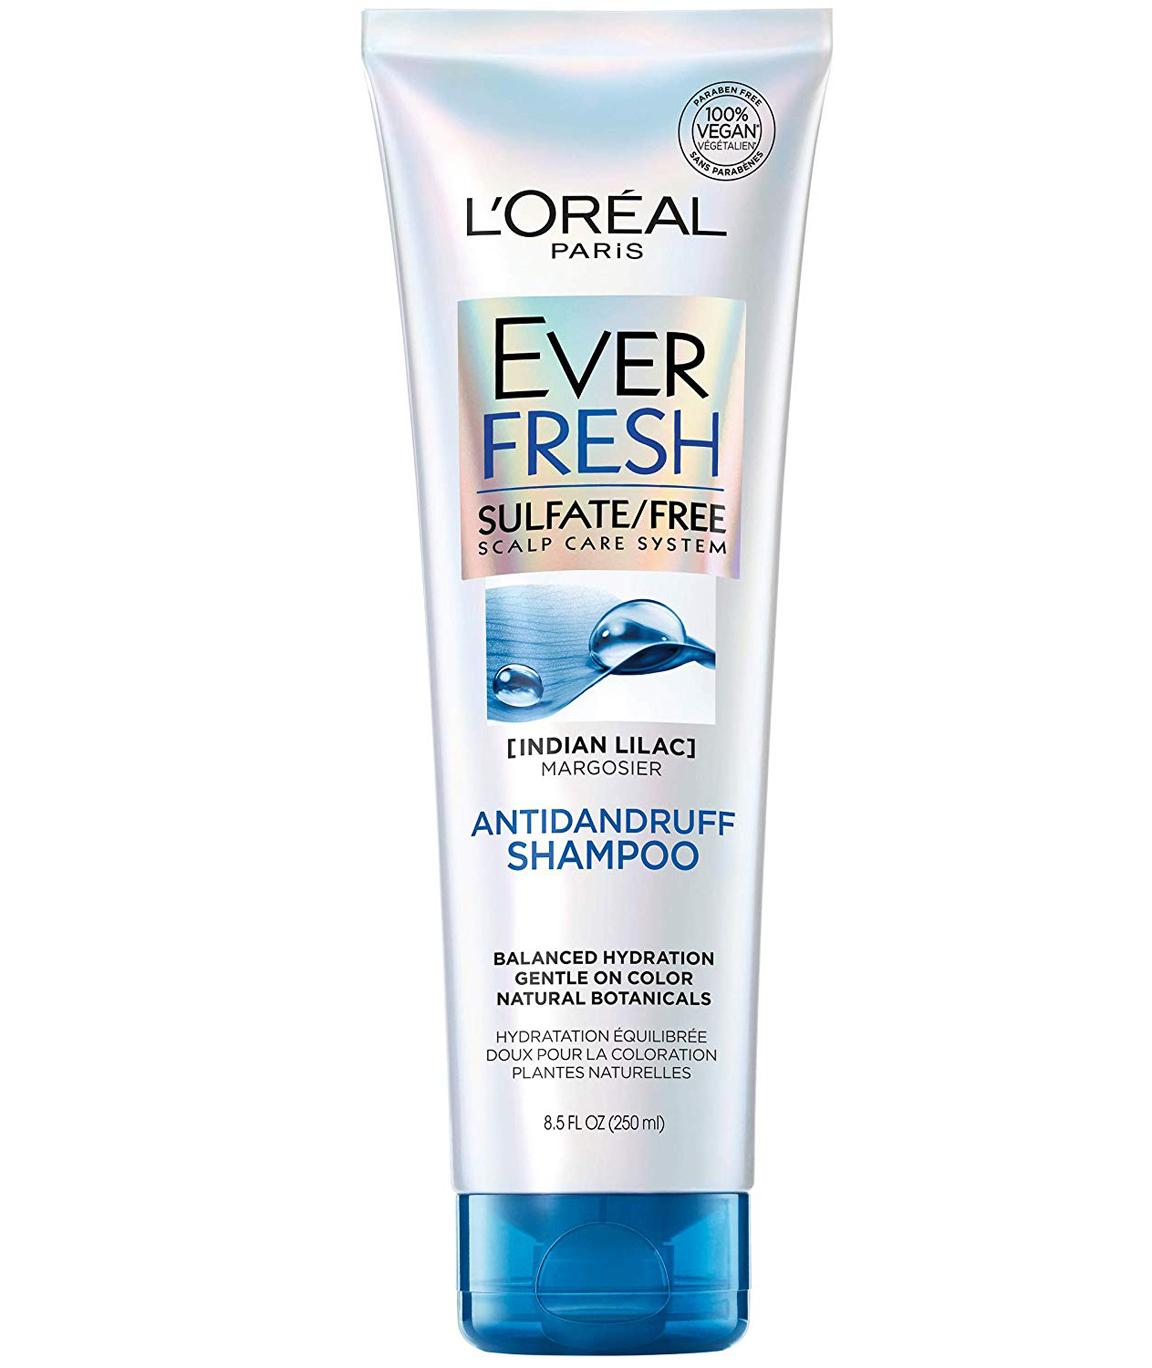 L`Oréal Paris EverFresh Antidandruff Shampoo Sulfate Free, 8.5 fl. oz.